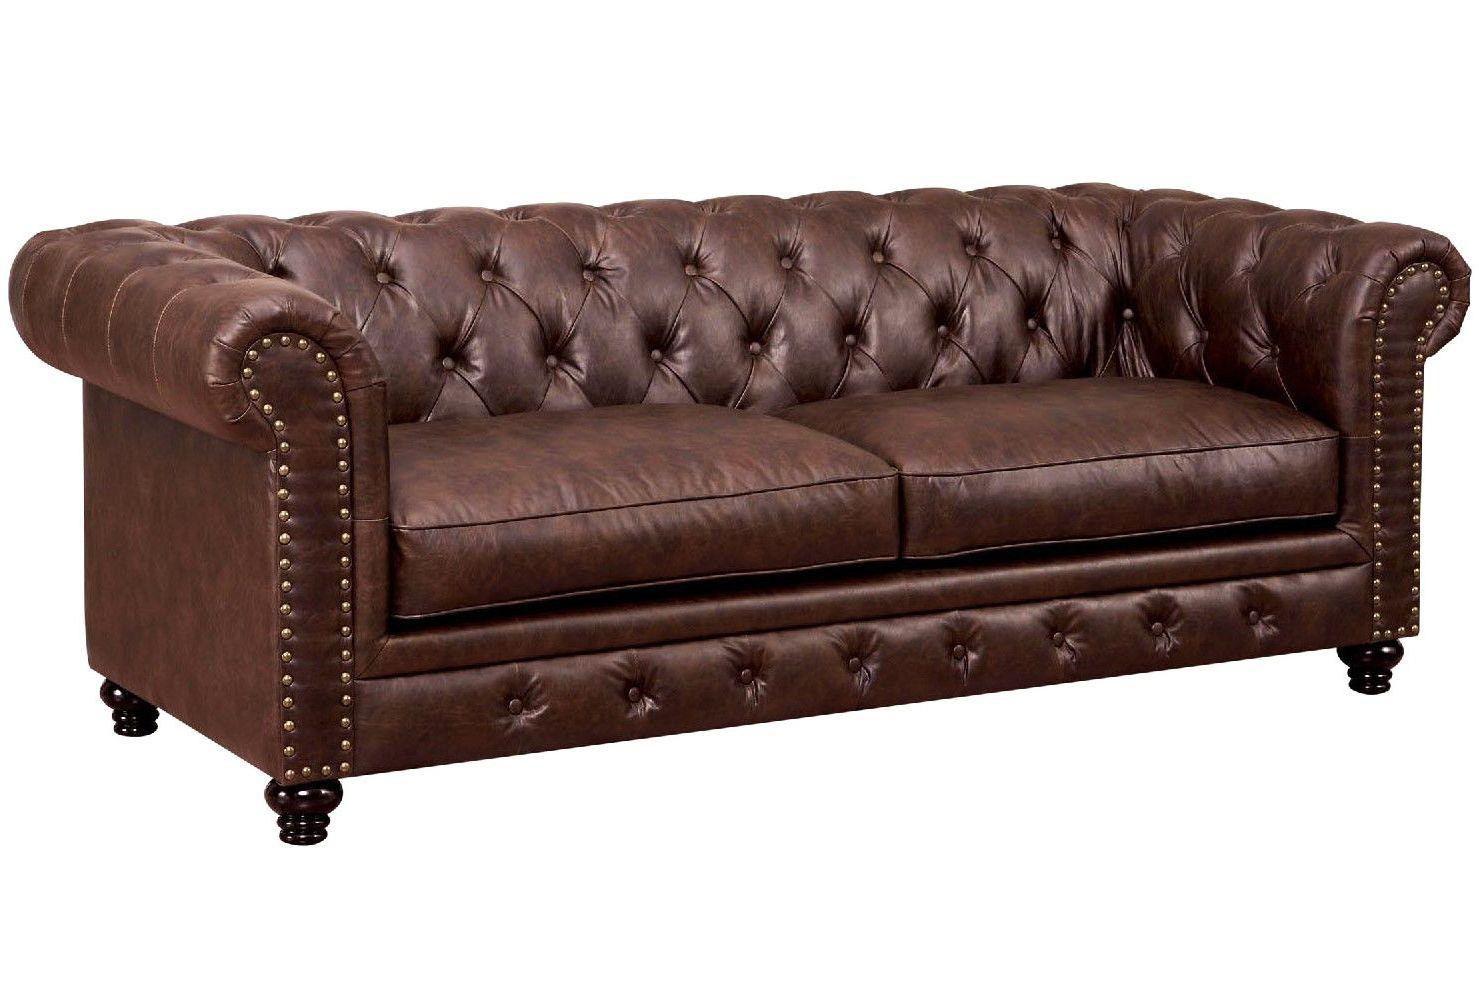 Eskridge Traditional Brown Chesterfield Sofa In Premium Regarding Chesterfield Sofas (View 11 of 15)